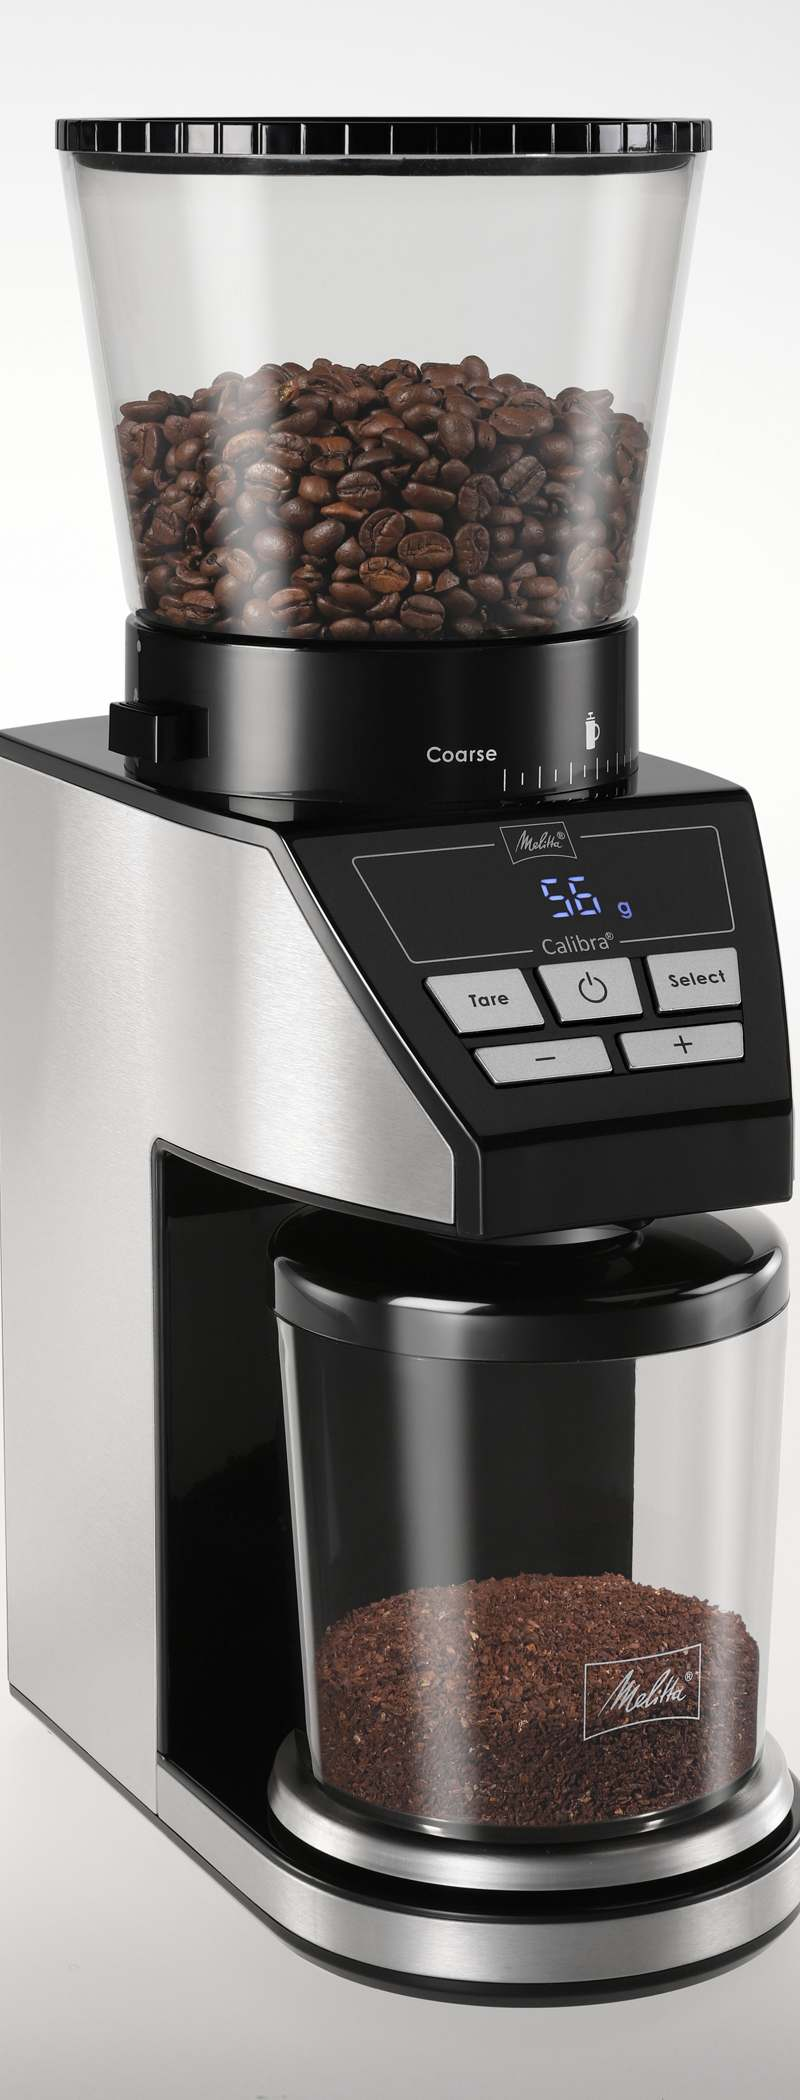 <h1>Melitta Kaffeemühle Calibra</h1><h3 style='font-size: 20px; margin: 0px 0px 15px 0px;'> -39 Mahlgradeinstellungen, integrierte digitale Waage</h3>